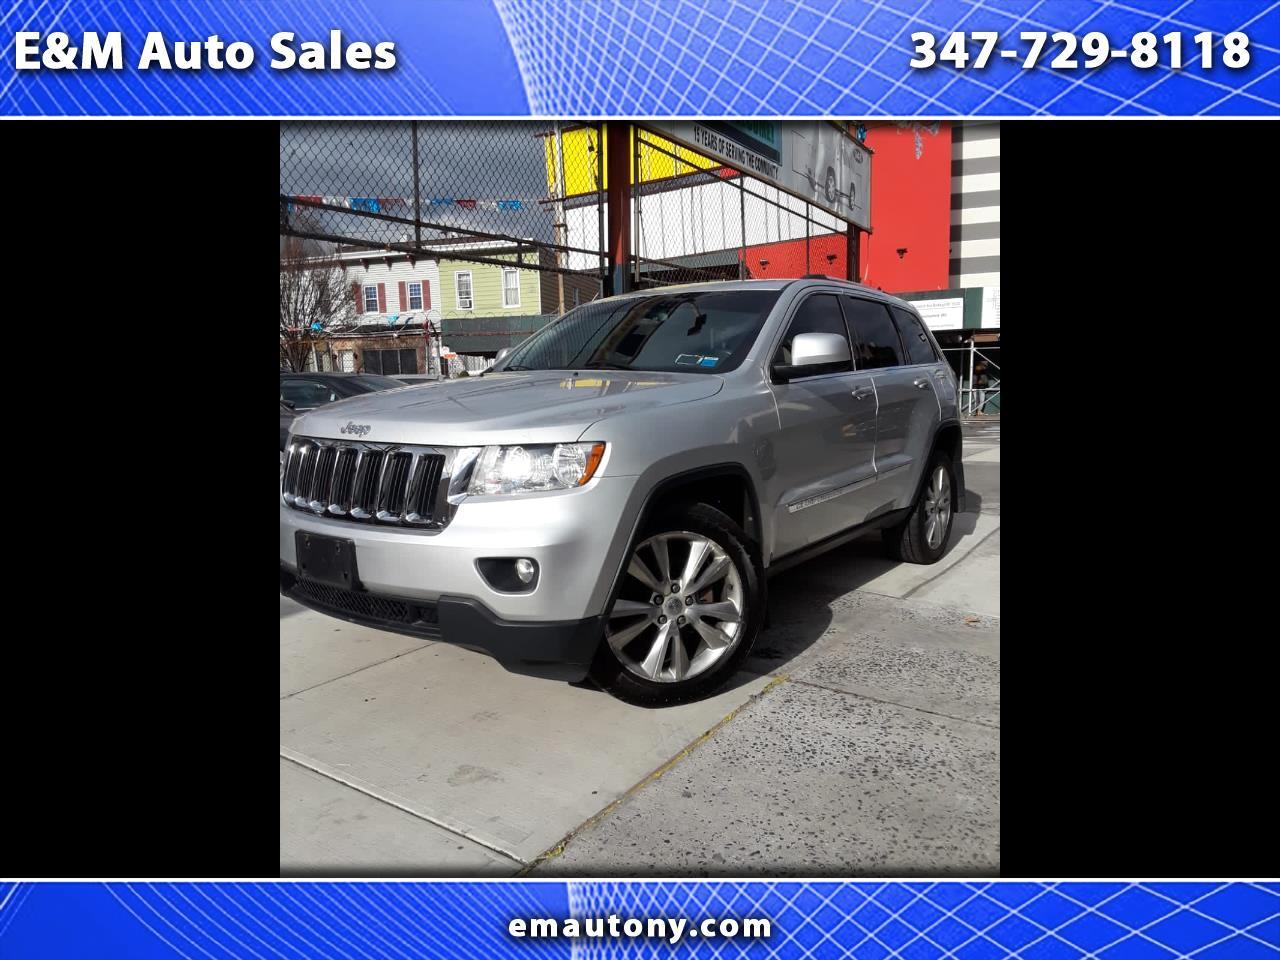 Jeep Grand Cherokee 4WD 4dr Laredo 2012